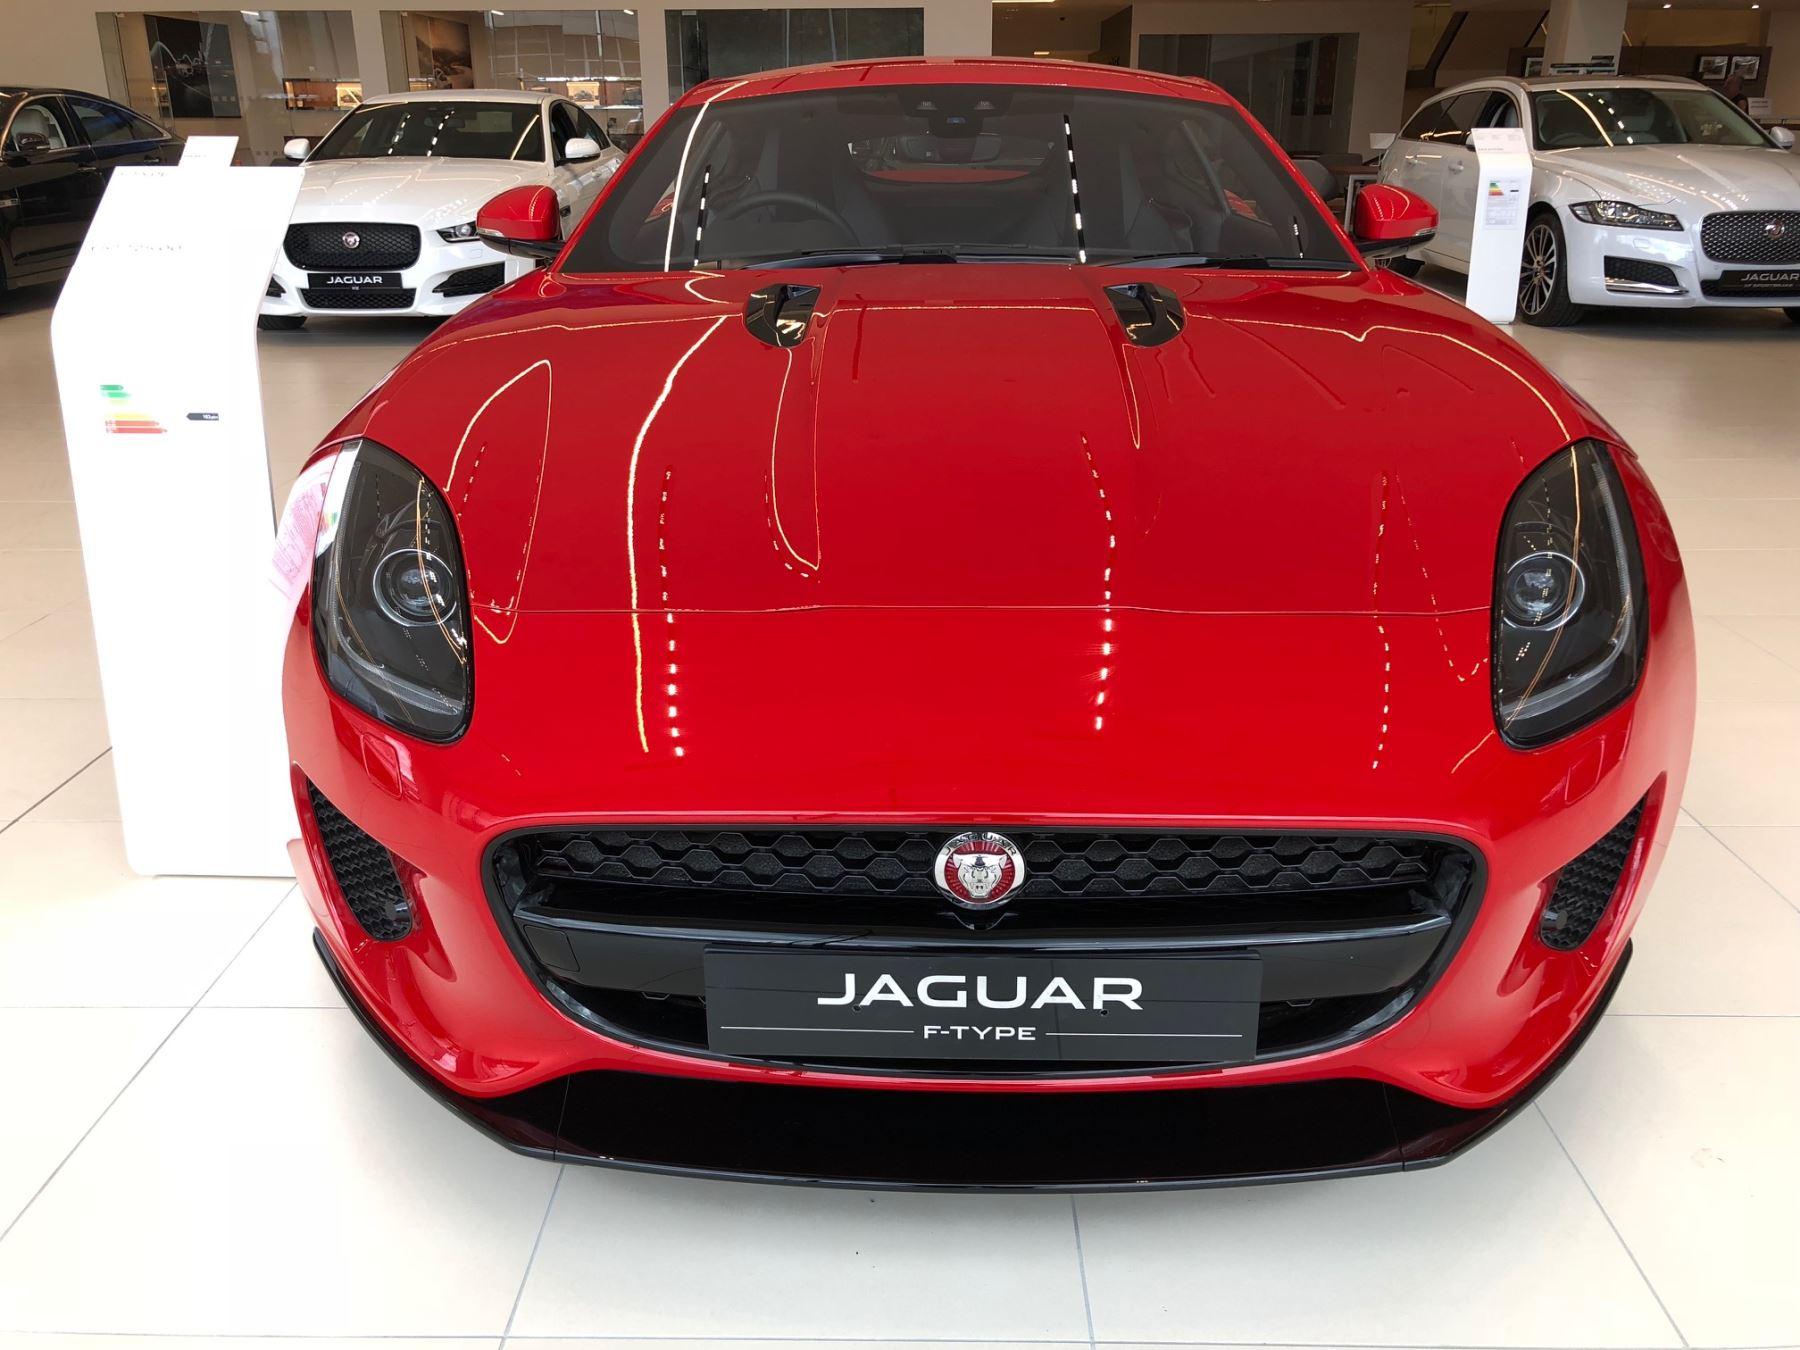 Jaguar F-TYPE 2.0 300PS RWD R-Dynamic image 2